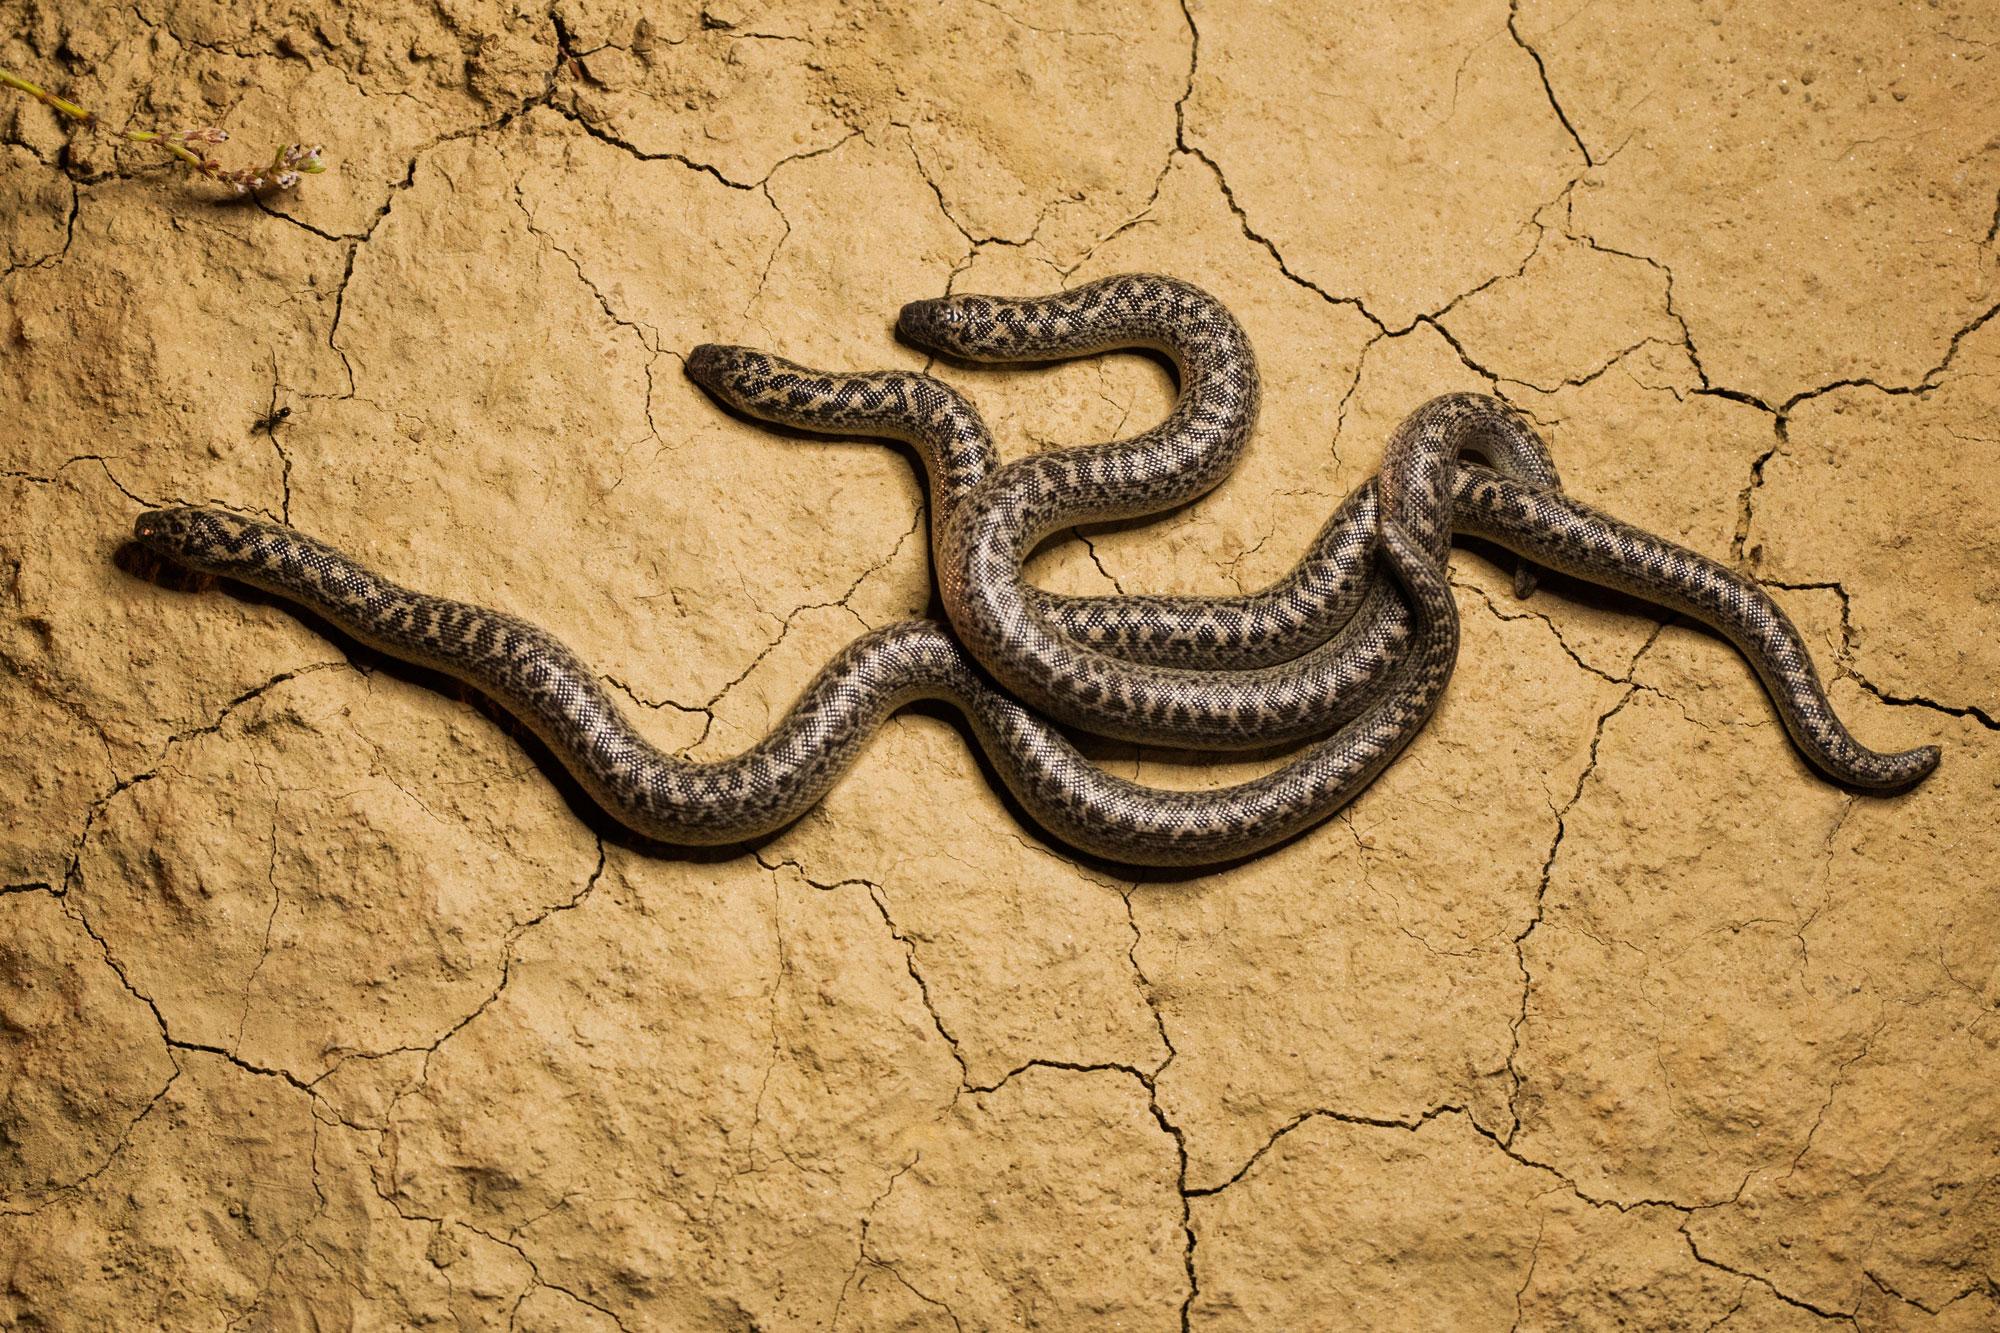 Boa de nisip (Eryx jaculus)